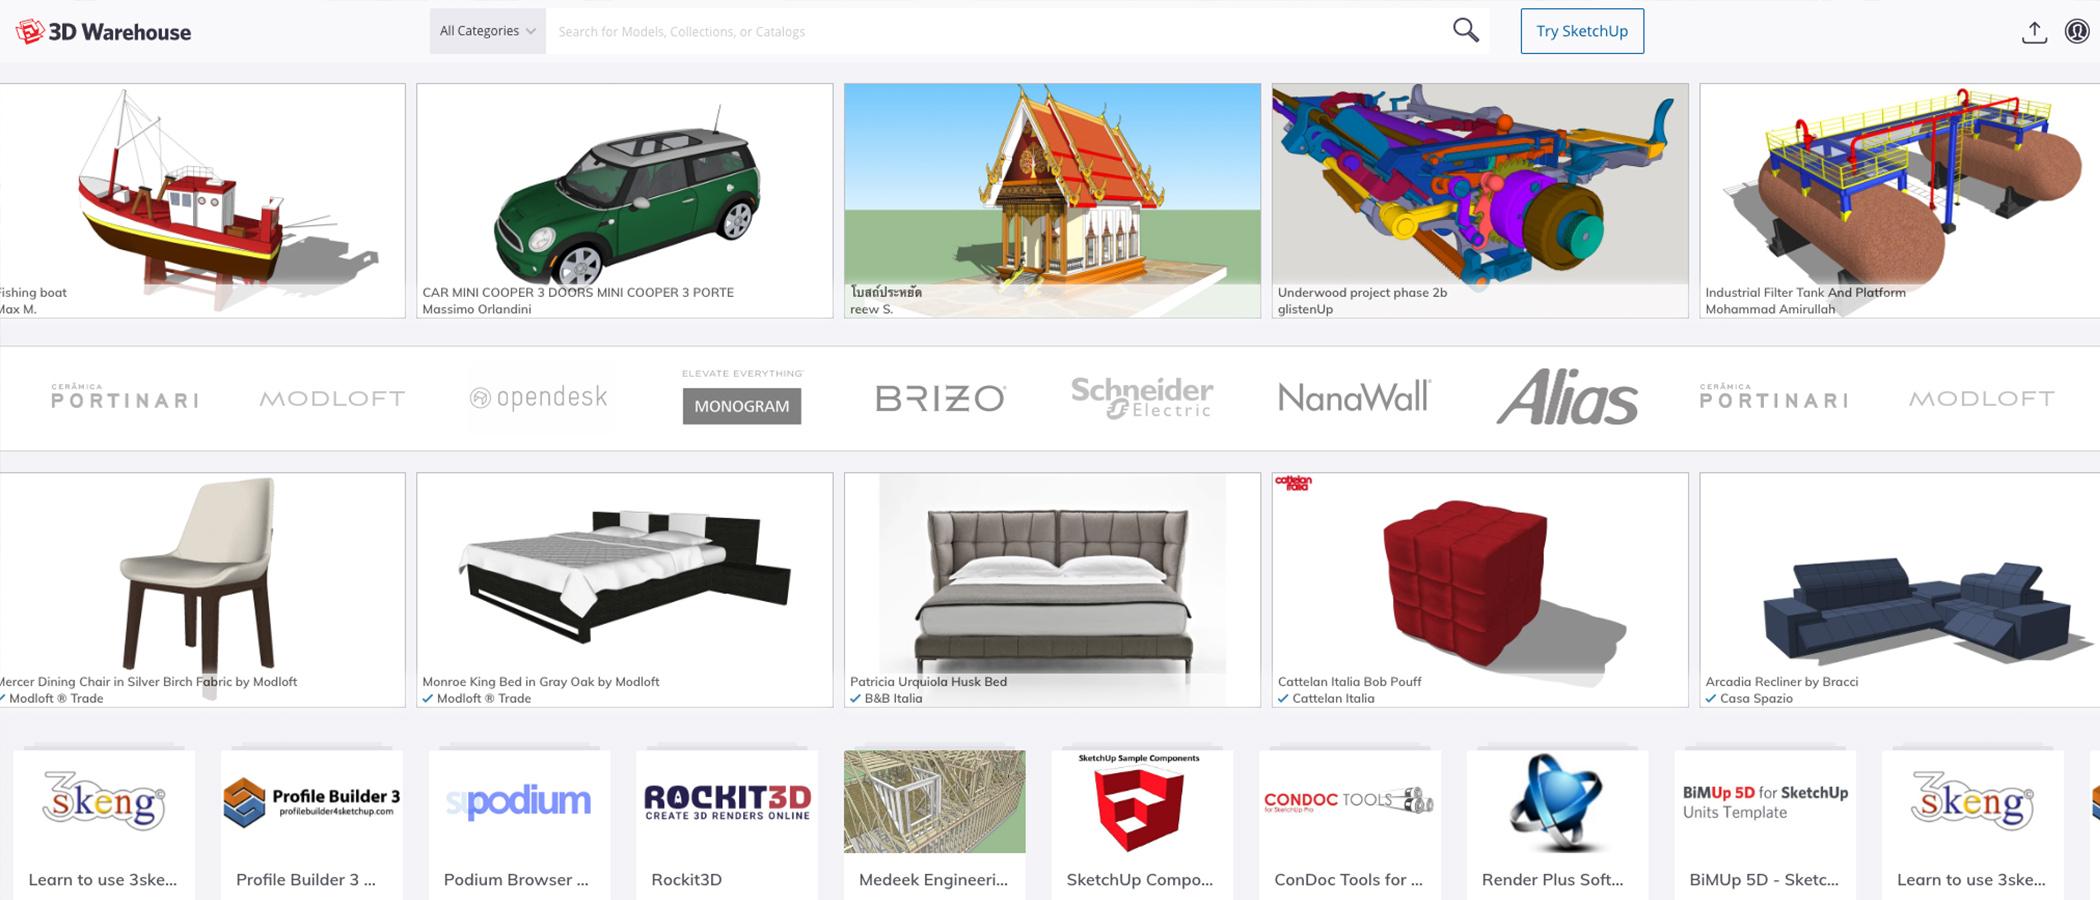 3D Warehouse | Biblioteka modeli 3D | SketchUp